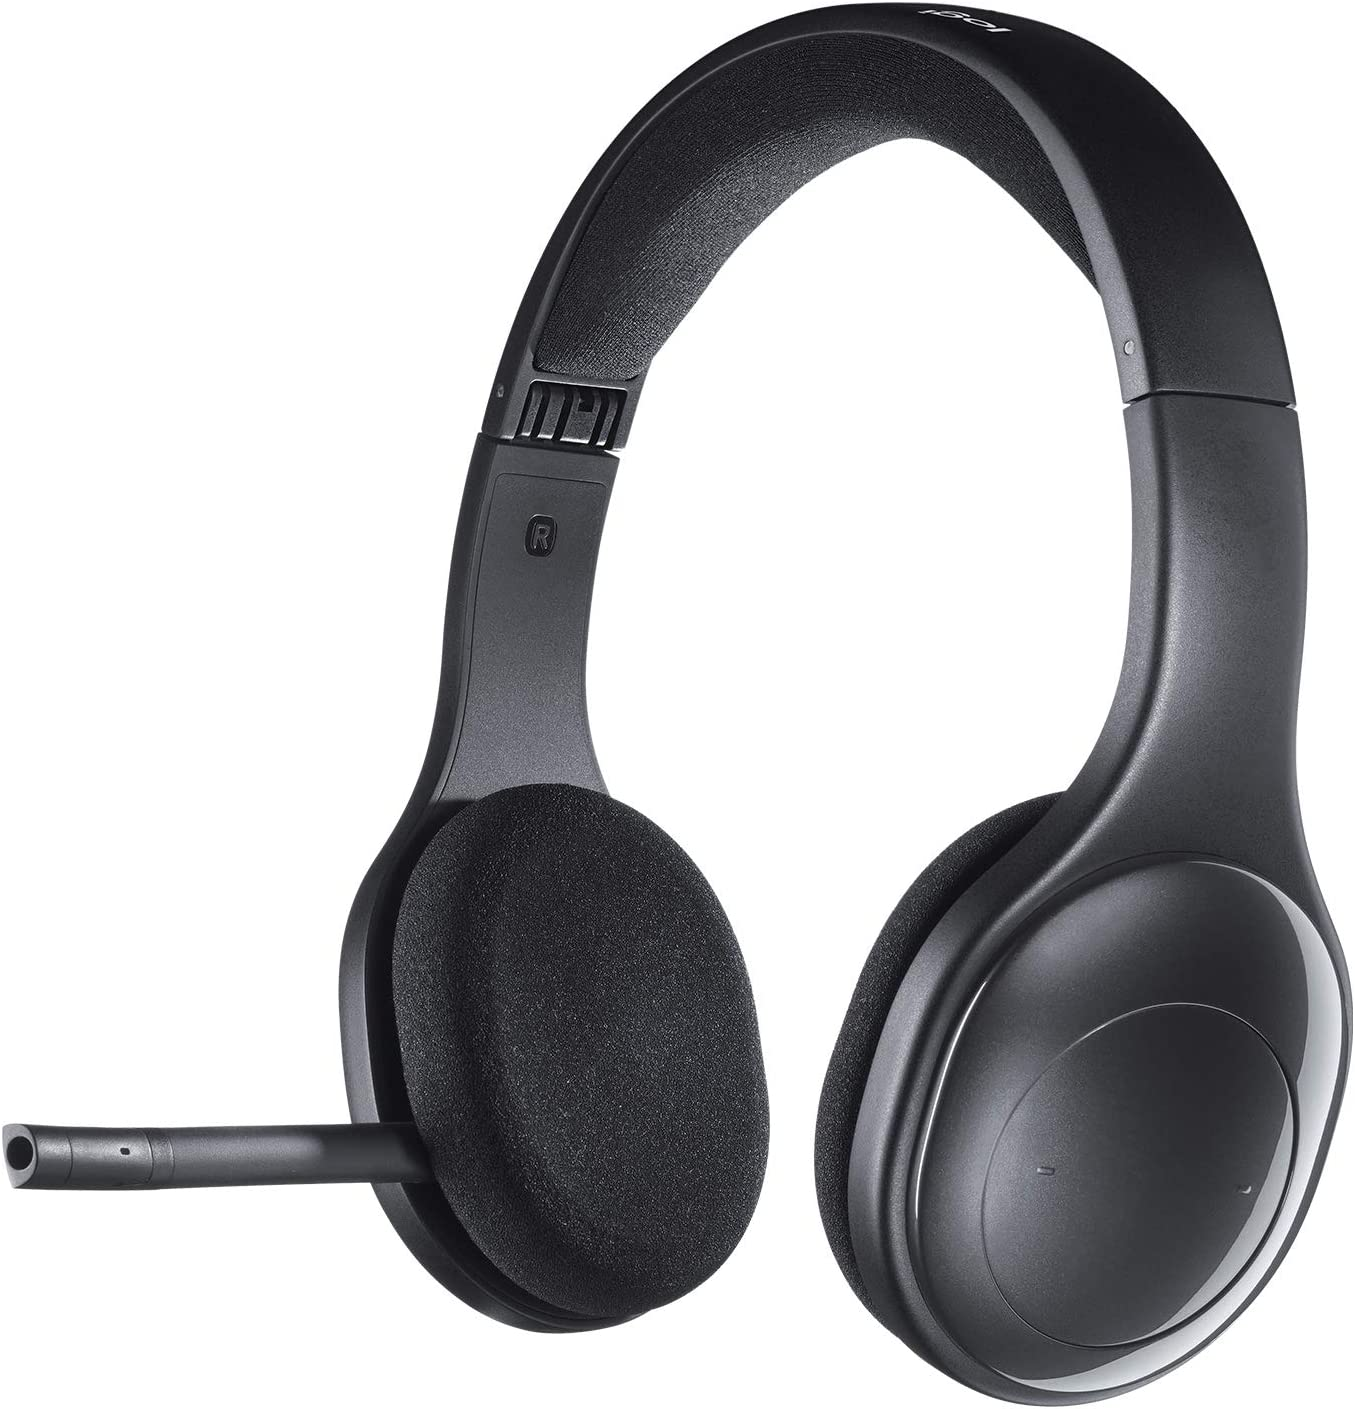 Logitech H800 Auriculares Inalámbricos Bluetooth, Sonido Estéreo de Alta Definición y Micrófono con Supresión de Ruido, Nano-Receptor USB, Multi-Dispositivos, Batería Recargable, PC/Mac/Móvil/Tablet